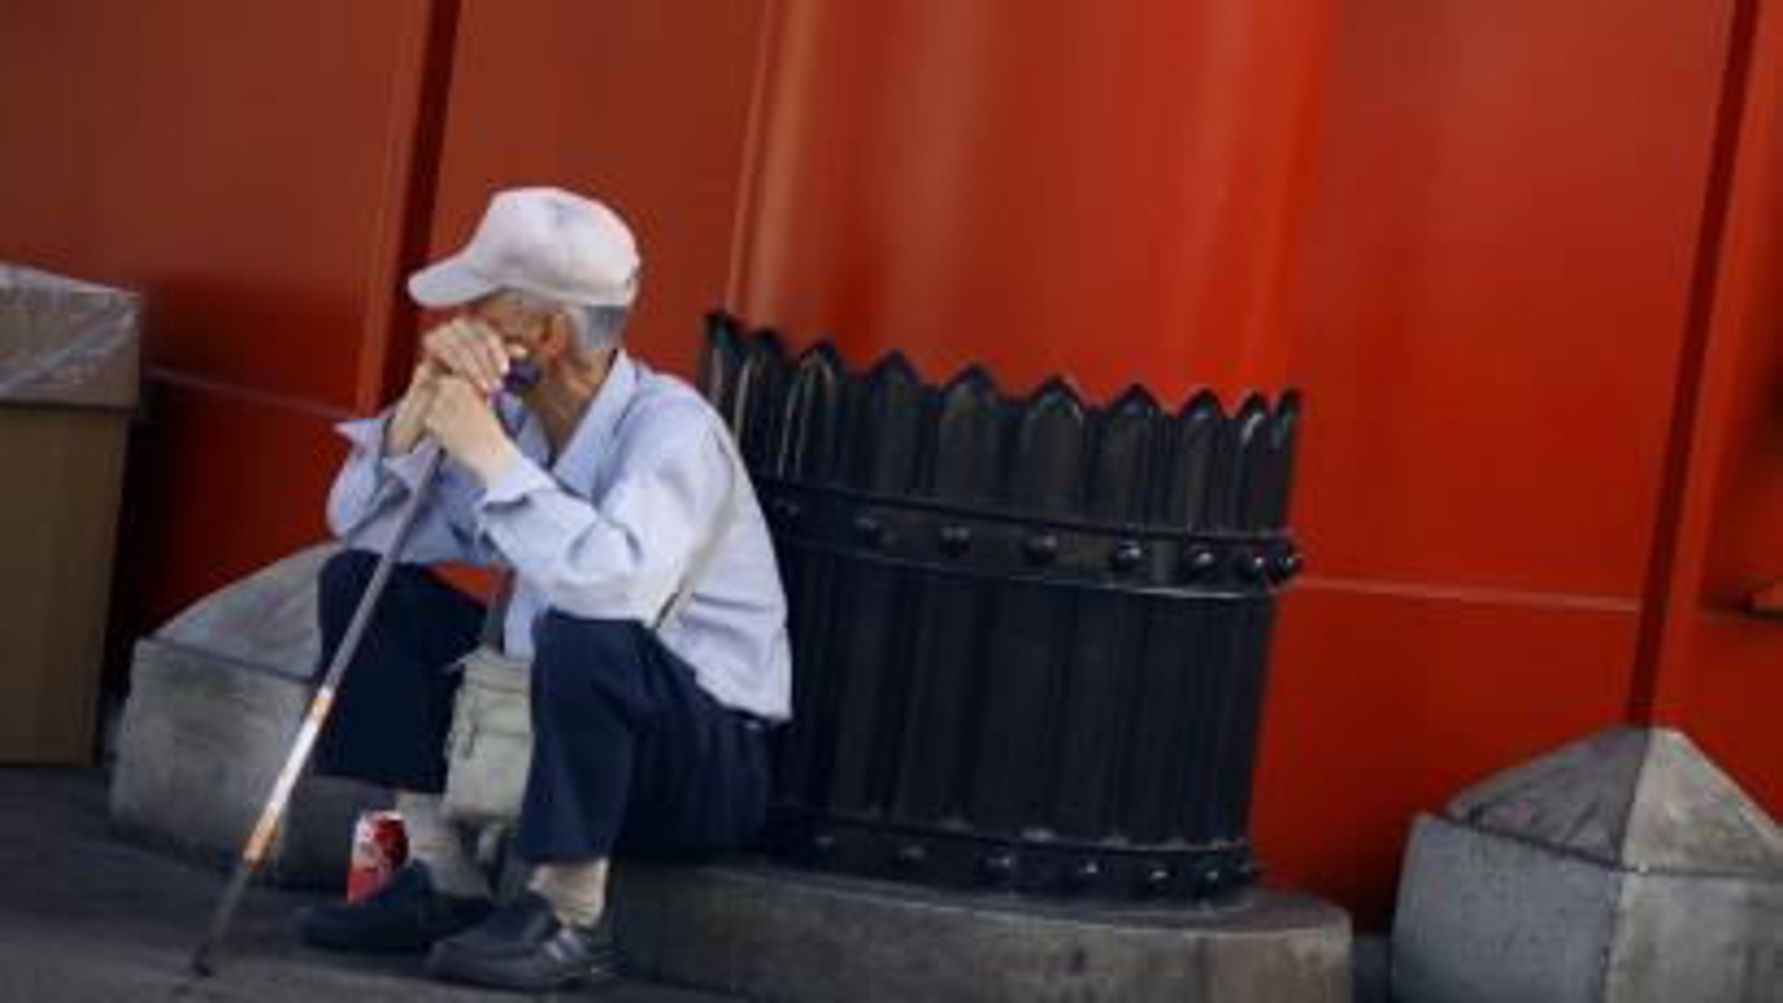 A boy clings to the wall of a temple gate as an elderly man sits nearby in Tokyo, Wednesday, Aug. 11, 2010. (AP Photo/Junji Kurokawa